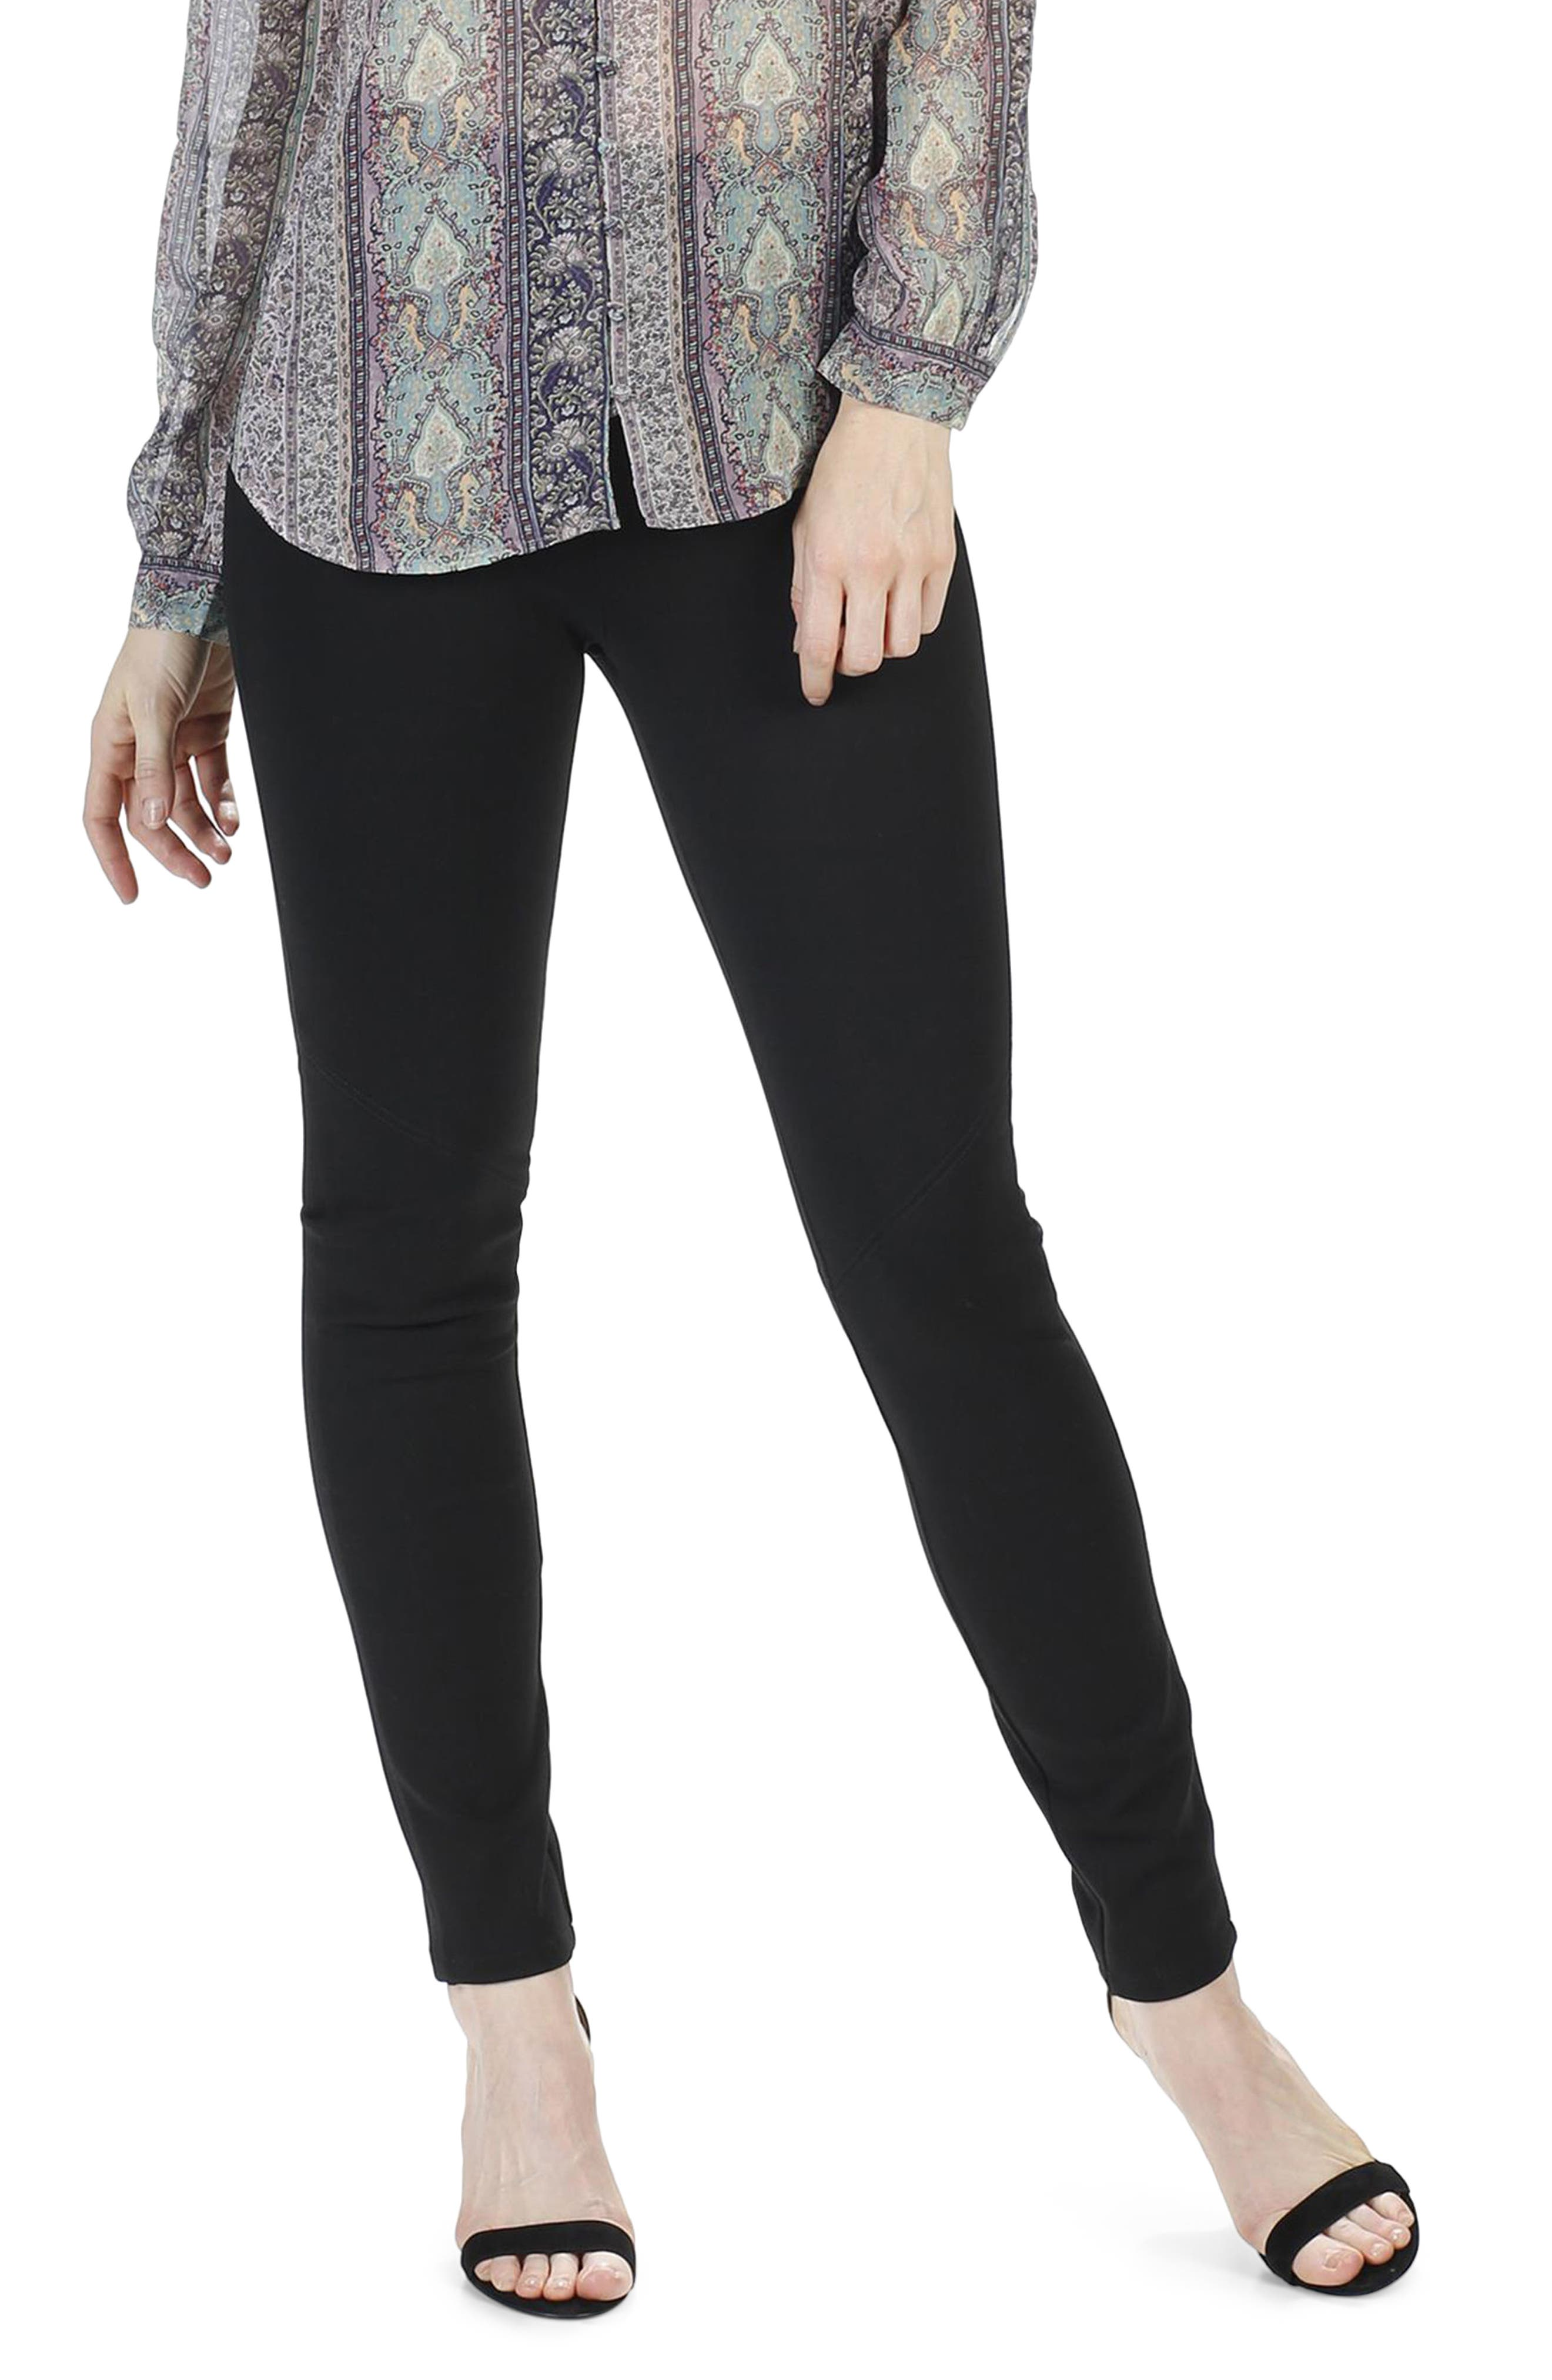 Alternate Image 1 Selected - PAIGE Myla High Waist Skinny Ponte Pants